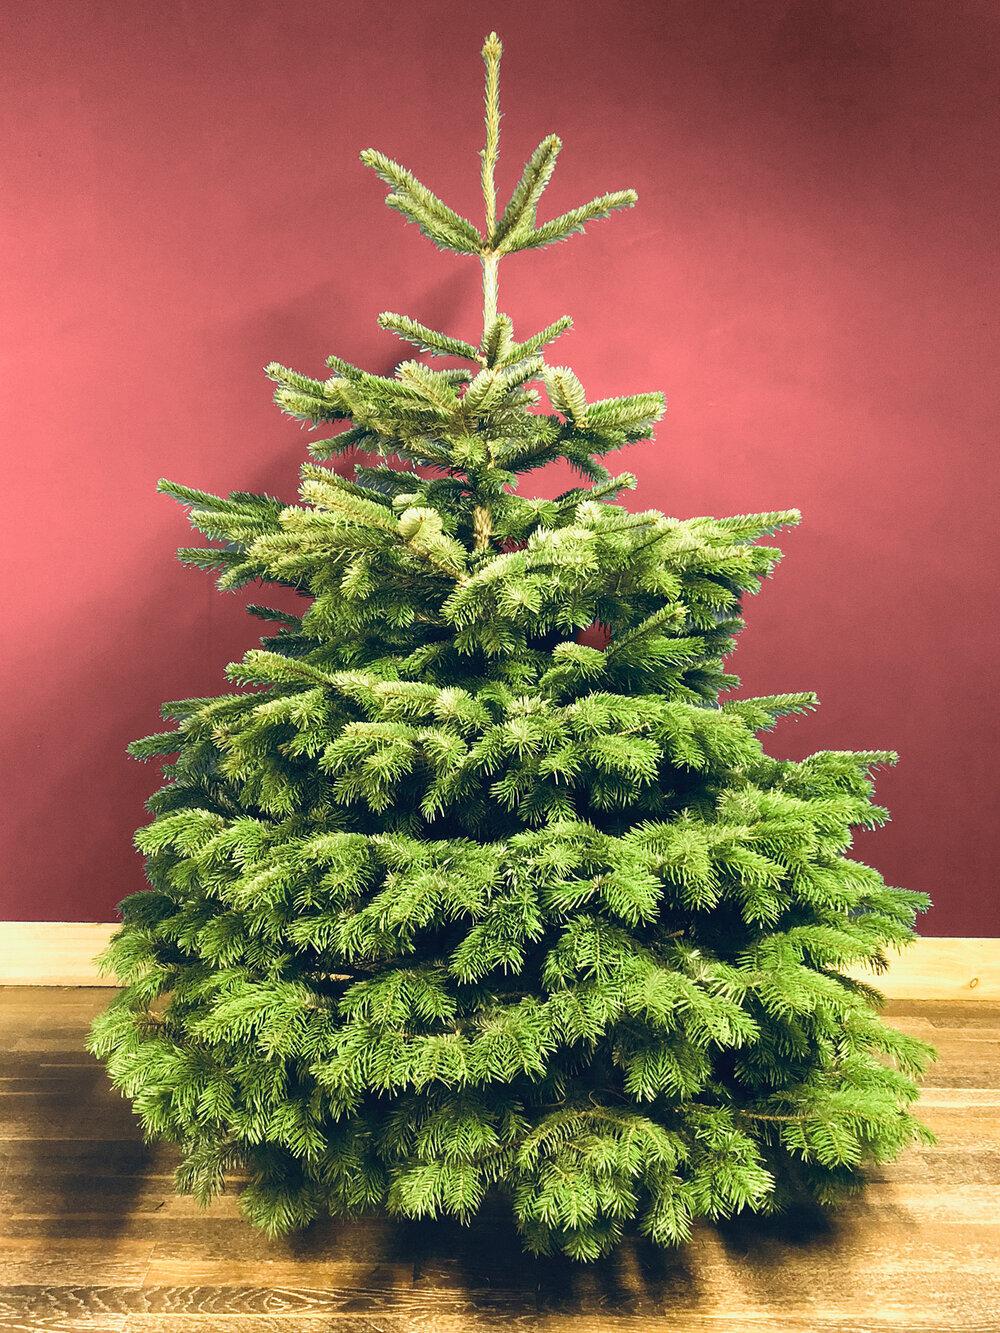 Nordmann Fir Christmas Trees in Somerset from Secret Valley